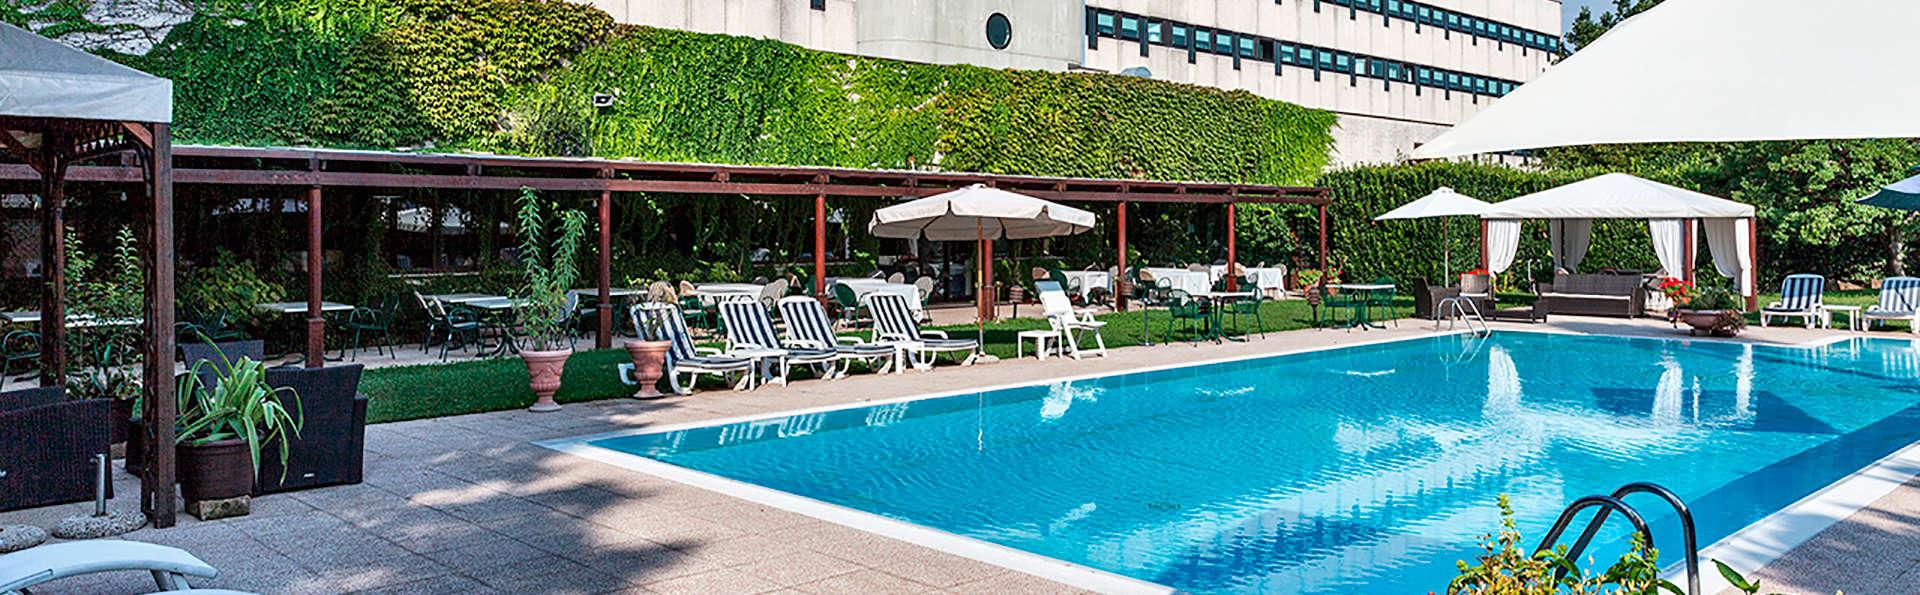 Hotel Saccardi & Spa - EDIT_frontpool.jpg